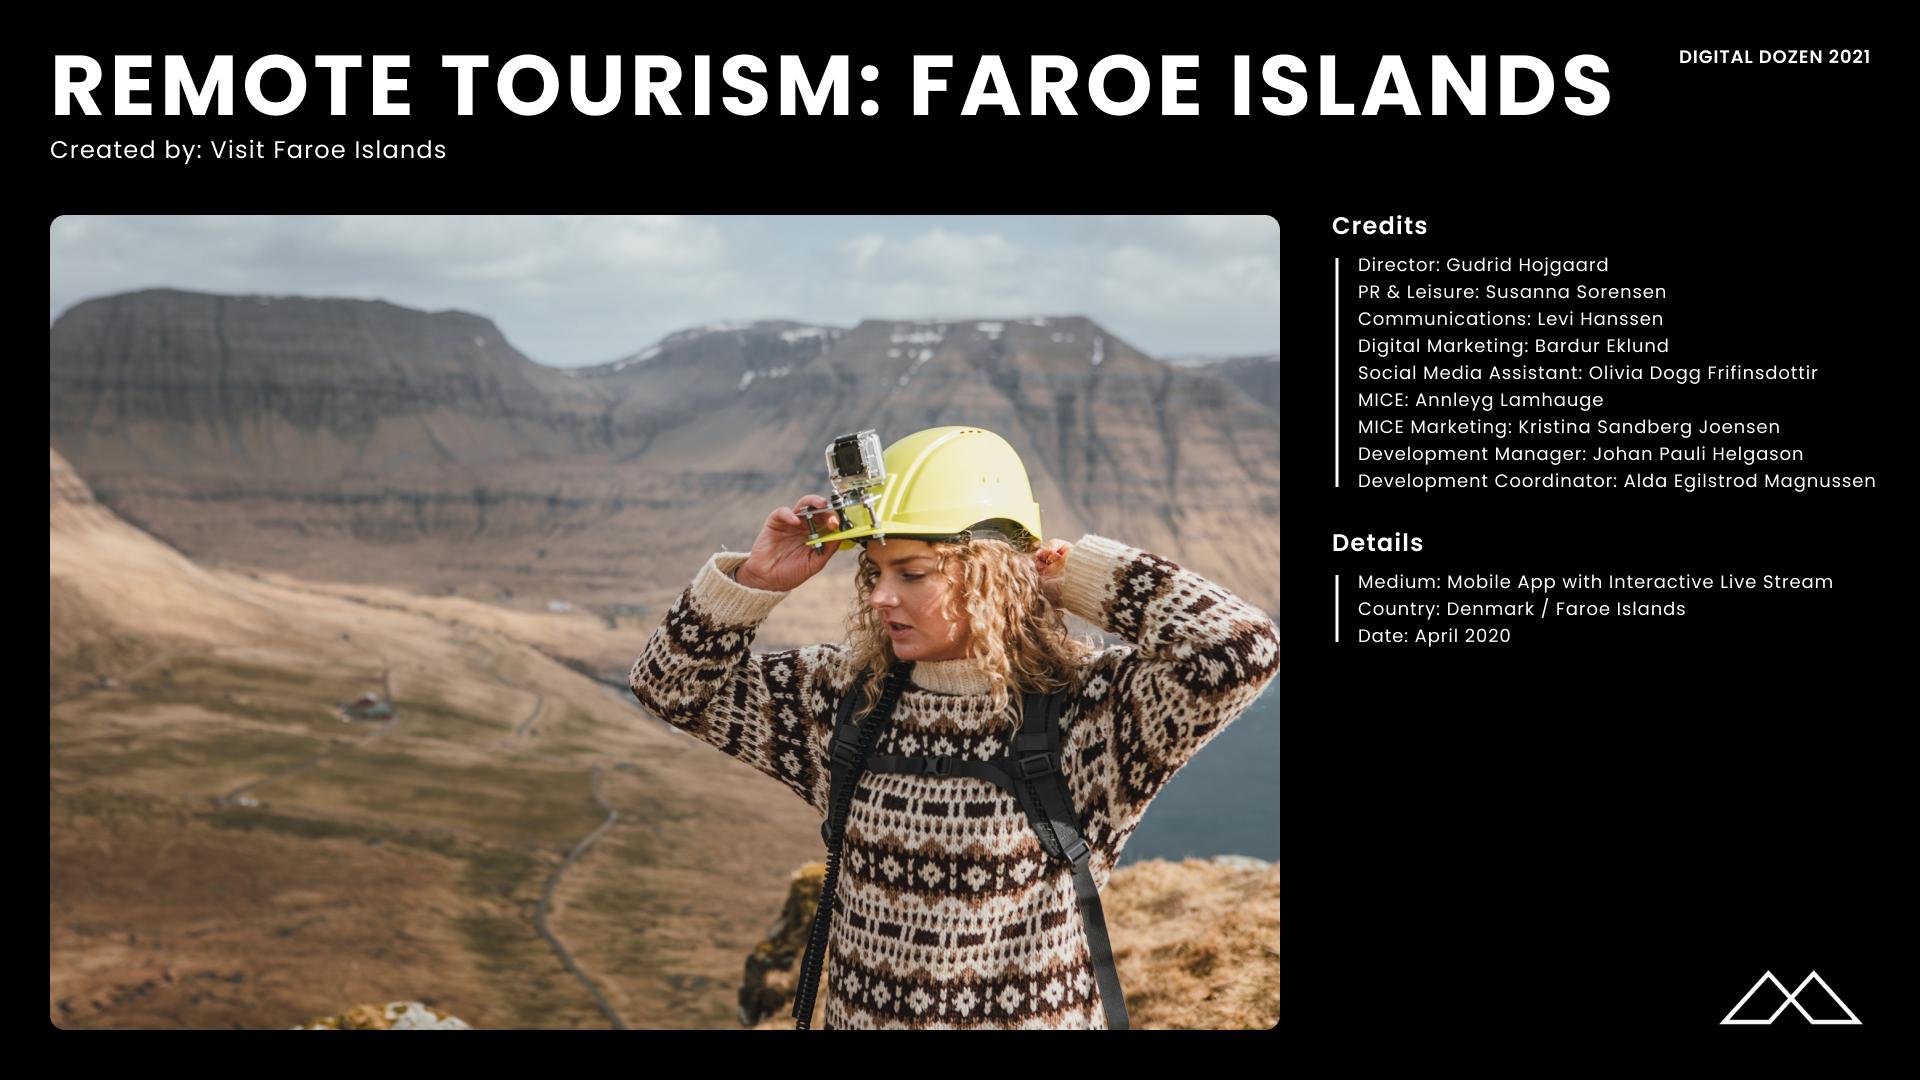 Remote Tourism Credits